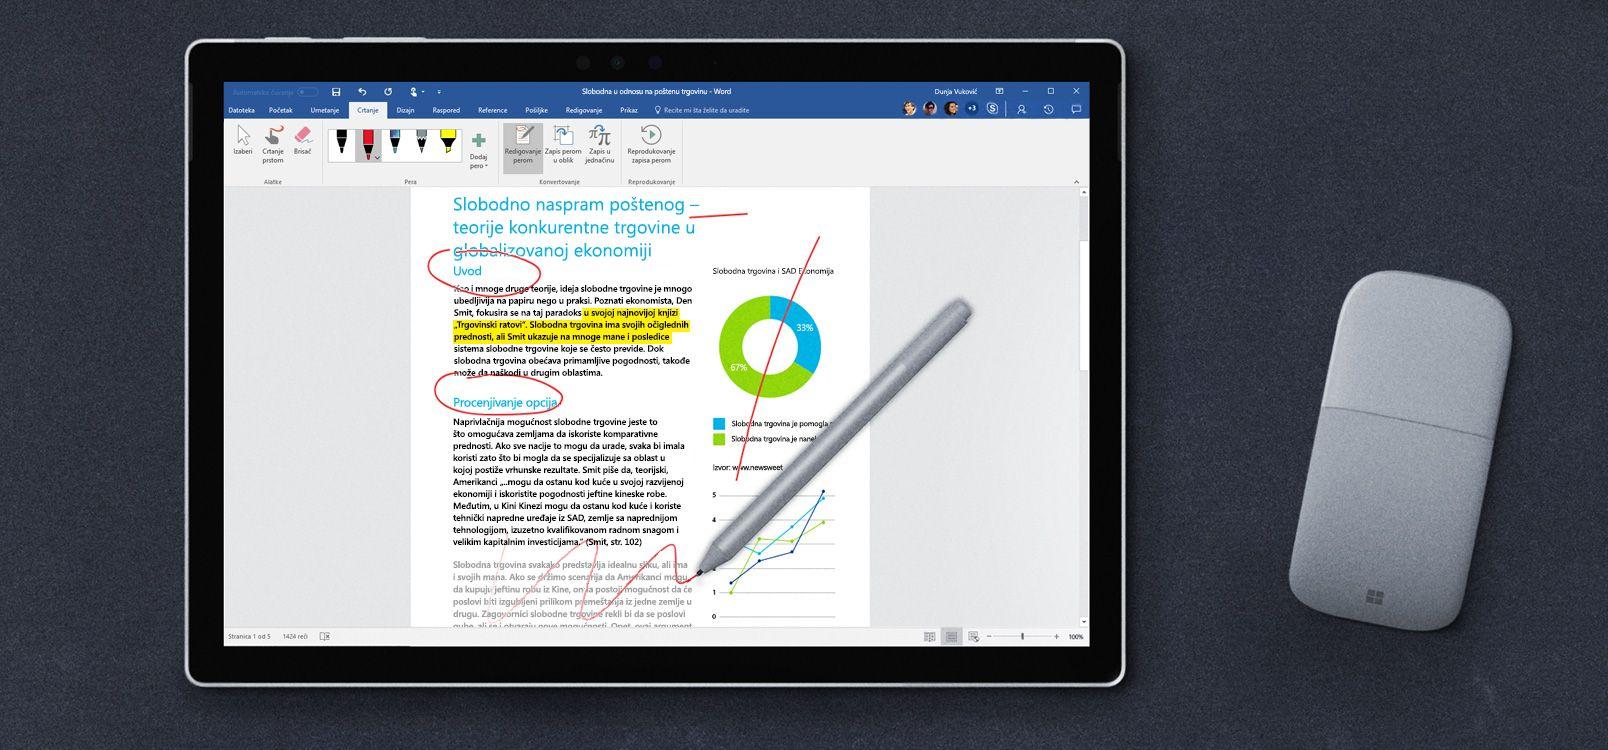 Ekran tableta koji prikazuje redigovanje perom